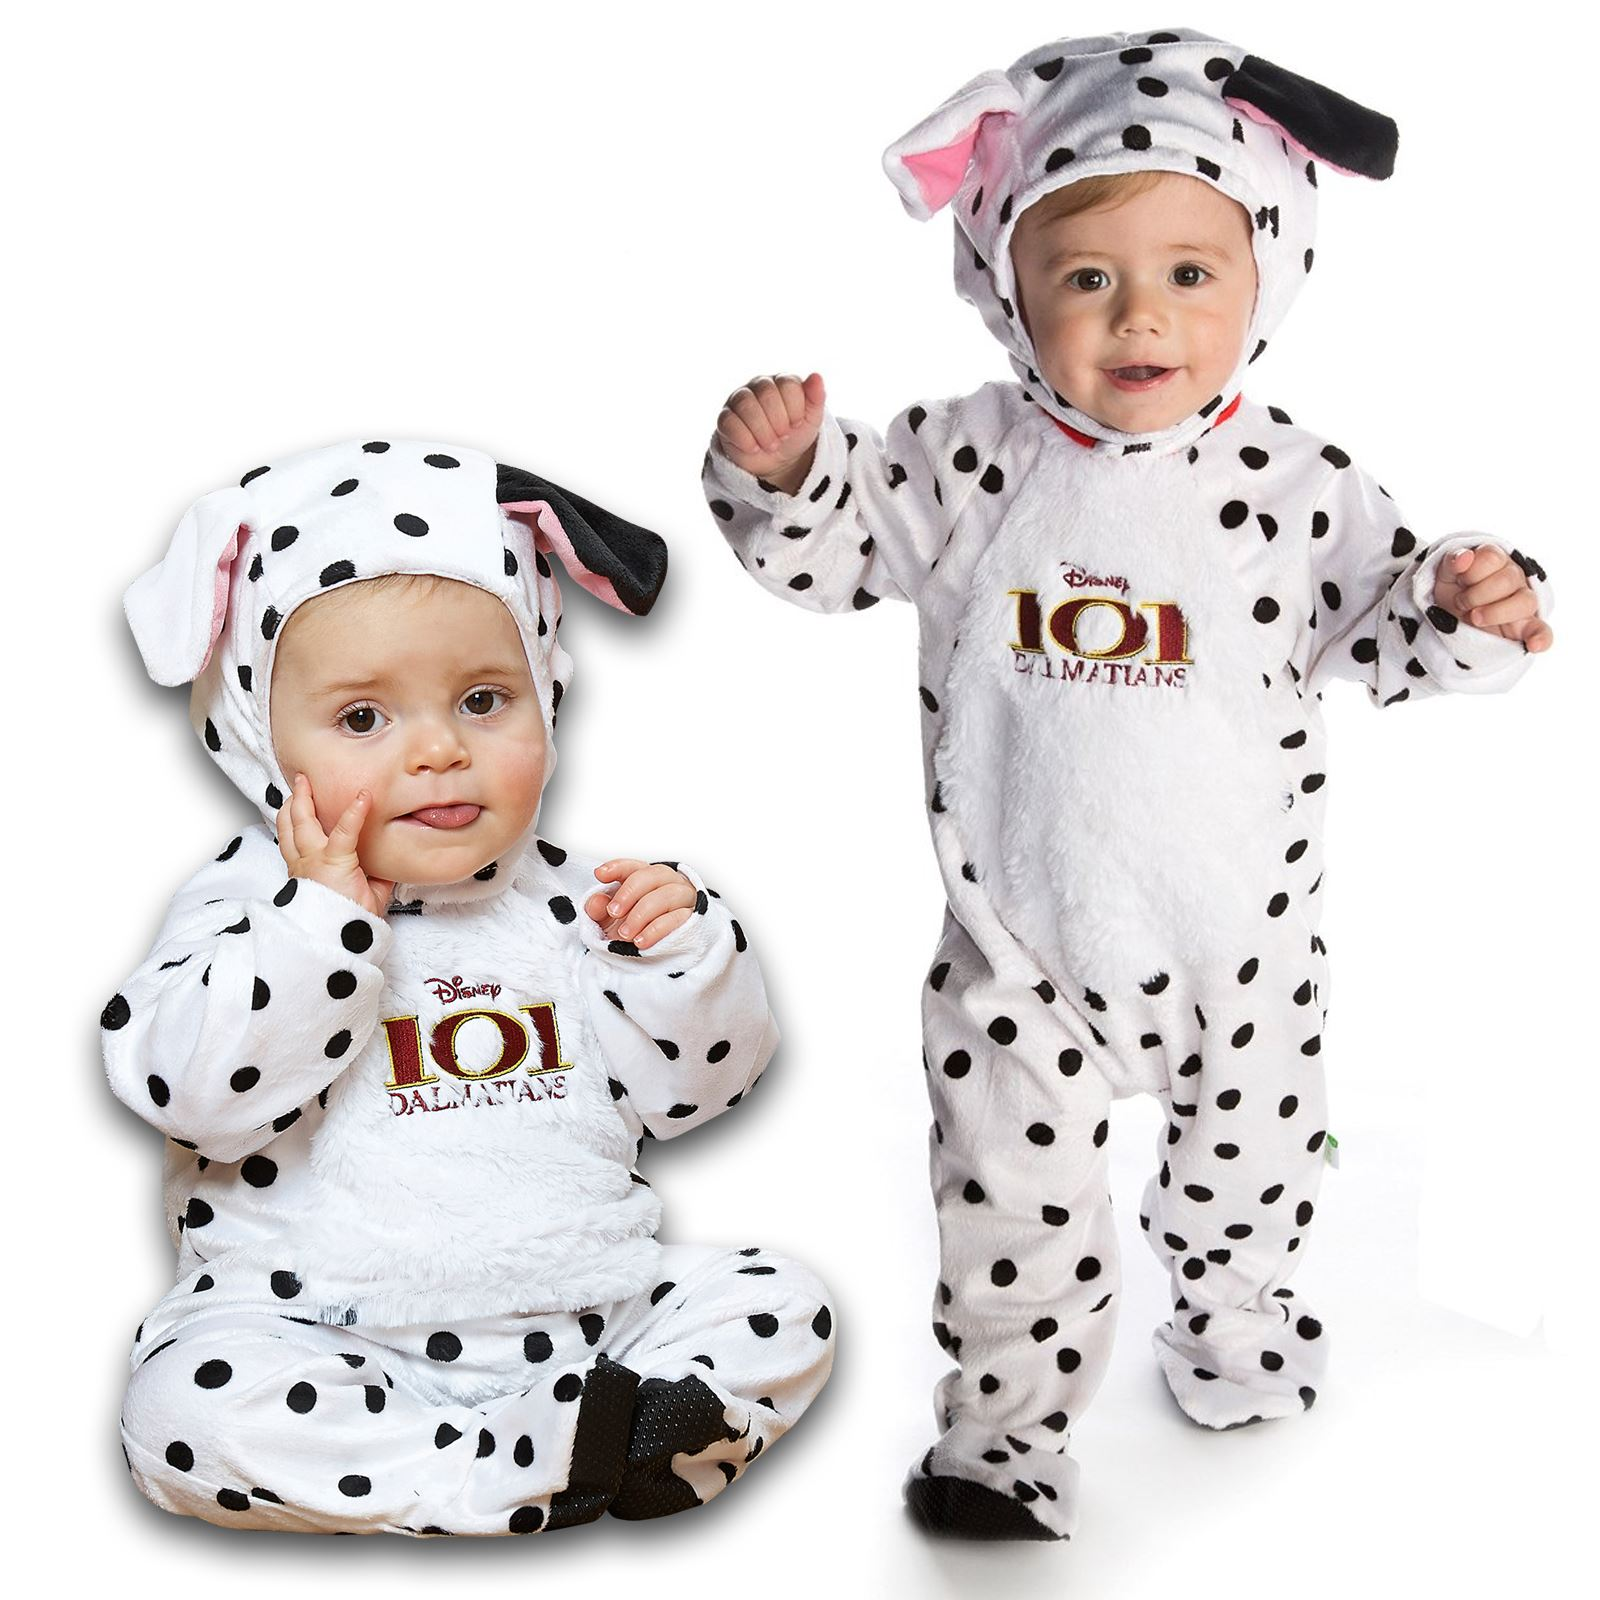 Baby Dalmatian Costume  sc 1 st  eBay & Disney 101 Dalmatian Soft Plush Jumpsuit Hat Ear Disney Baby Fancy ...